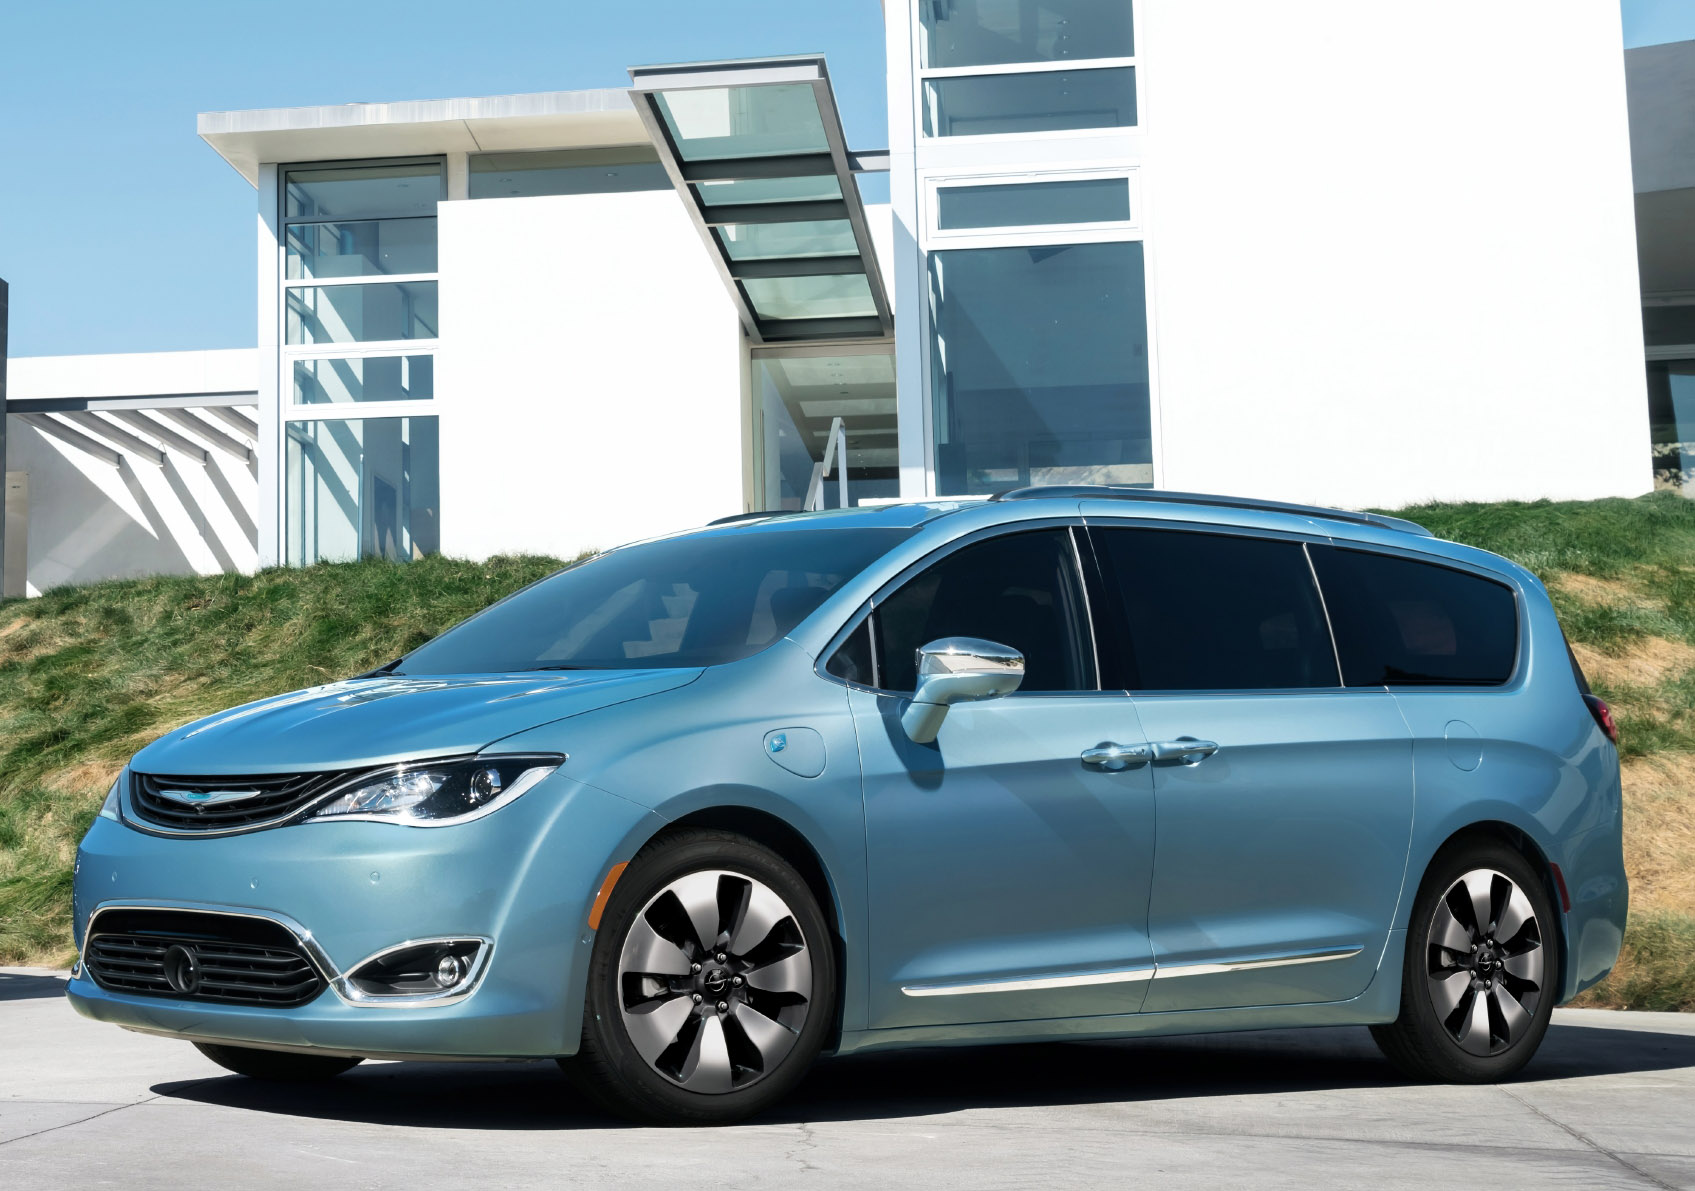 Chrysler's 2017 Pacifica hybrid minivan can go 30-plus miles on battery